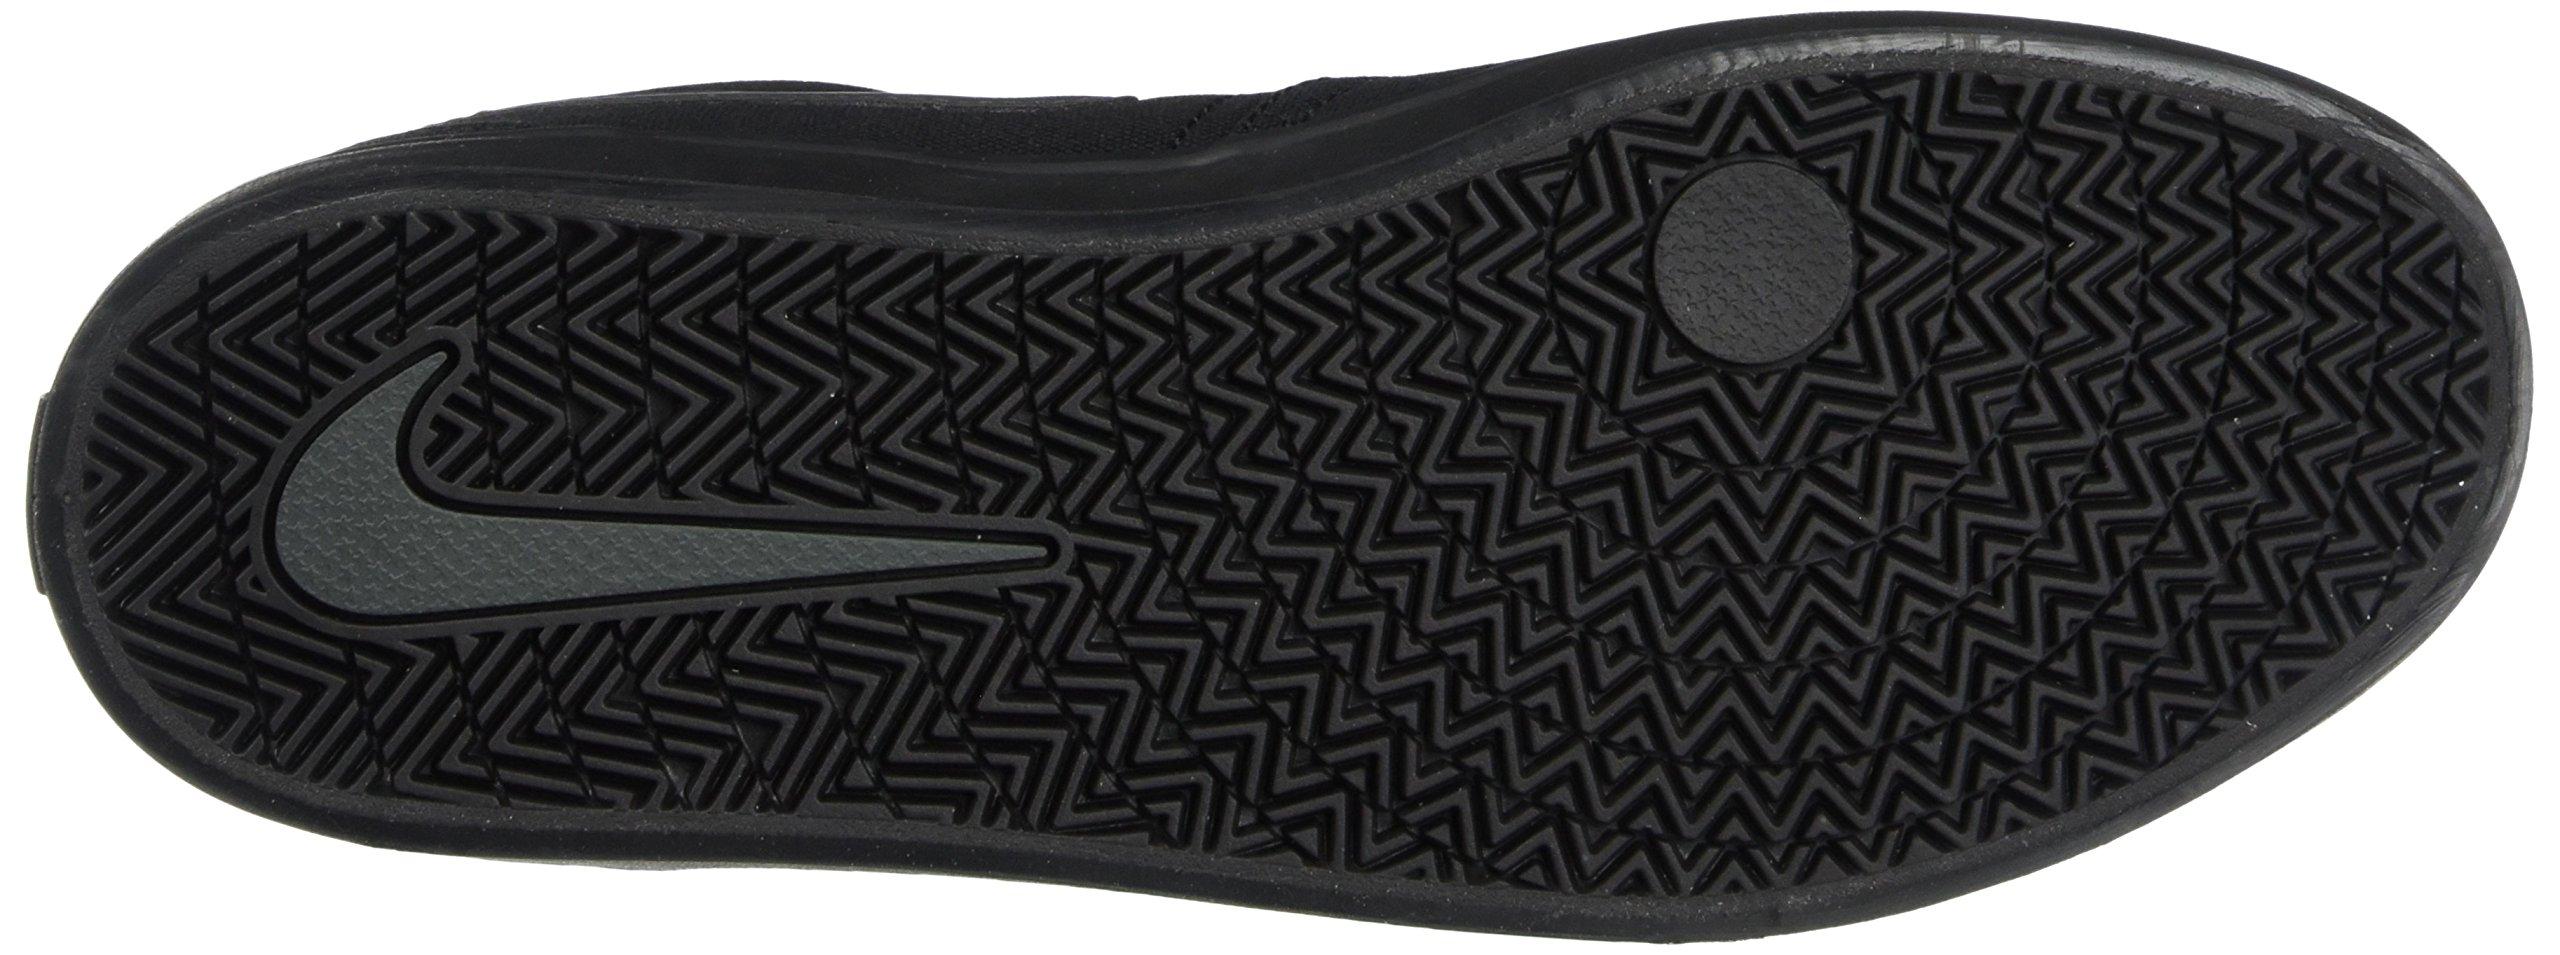 Nike Unisex SB Check Solar CNVS Black/Anthracite Skate Shoe 8.5 Men US / 10 Women US by Nike (Image #3)